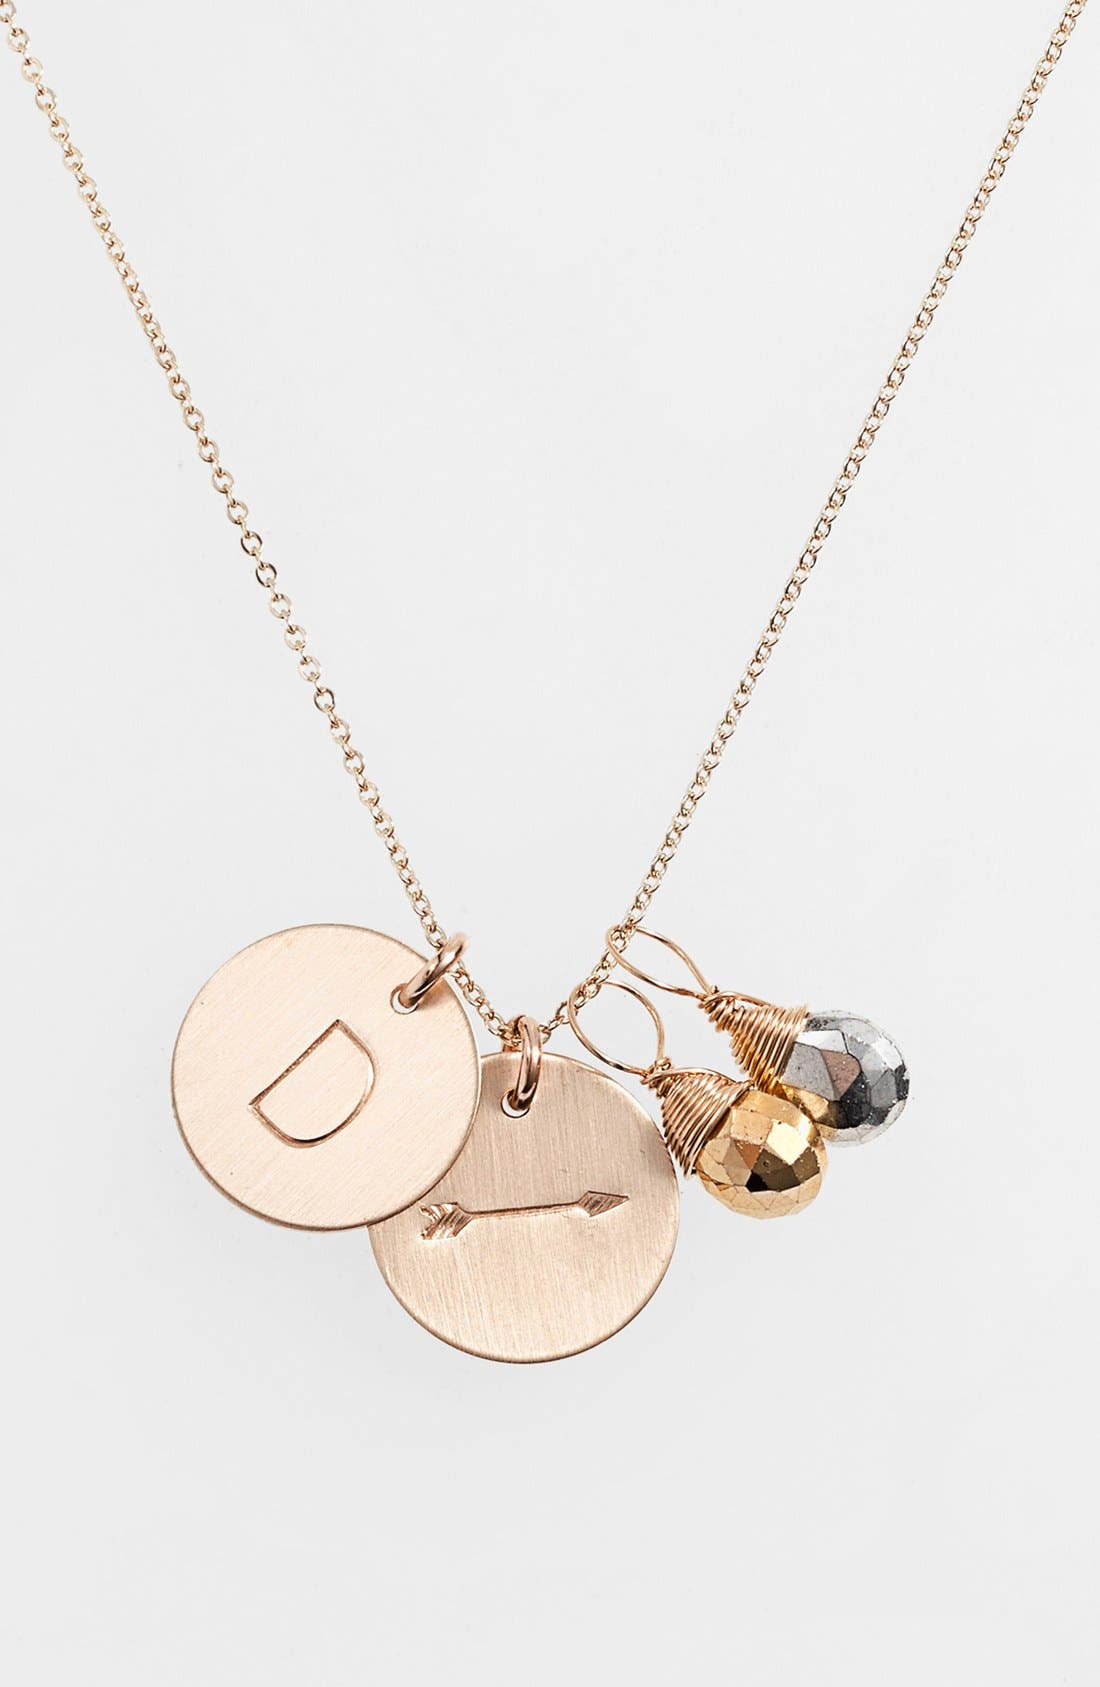 NASHELLE Pyrite Initial & Arrow 14k-Gold Fill Disc Necklace, Main, color, GOLD PYRITE/ SILVER PYRITE D